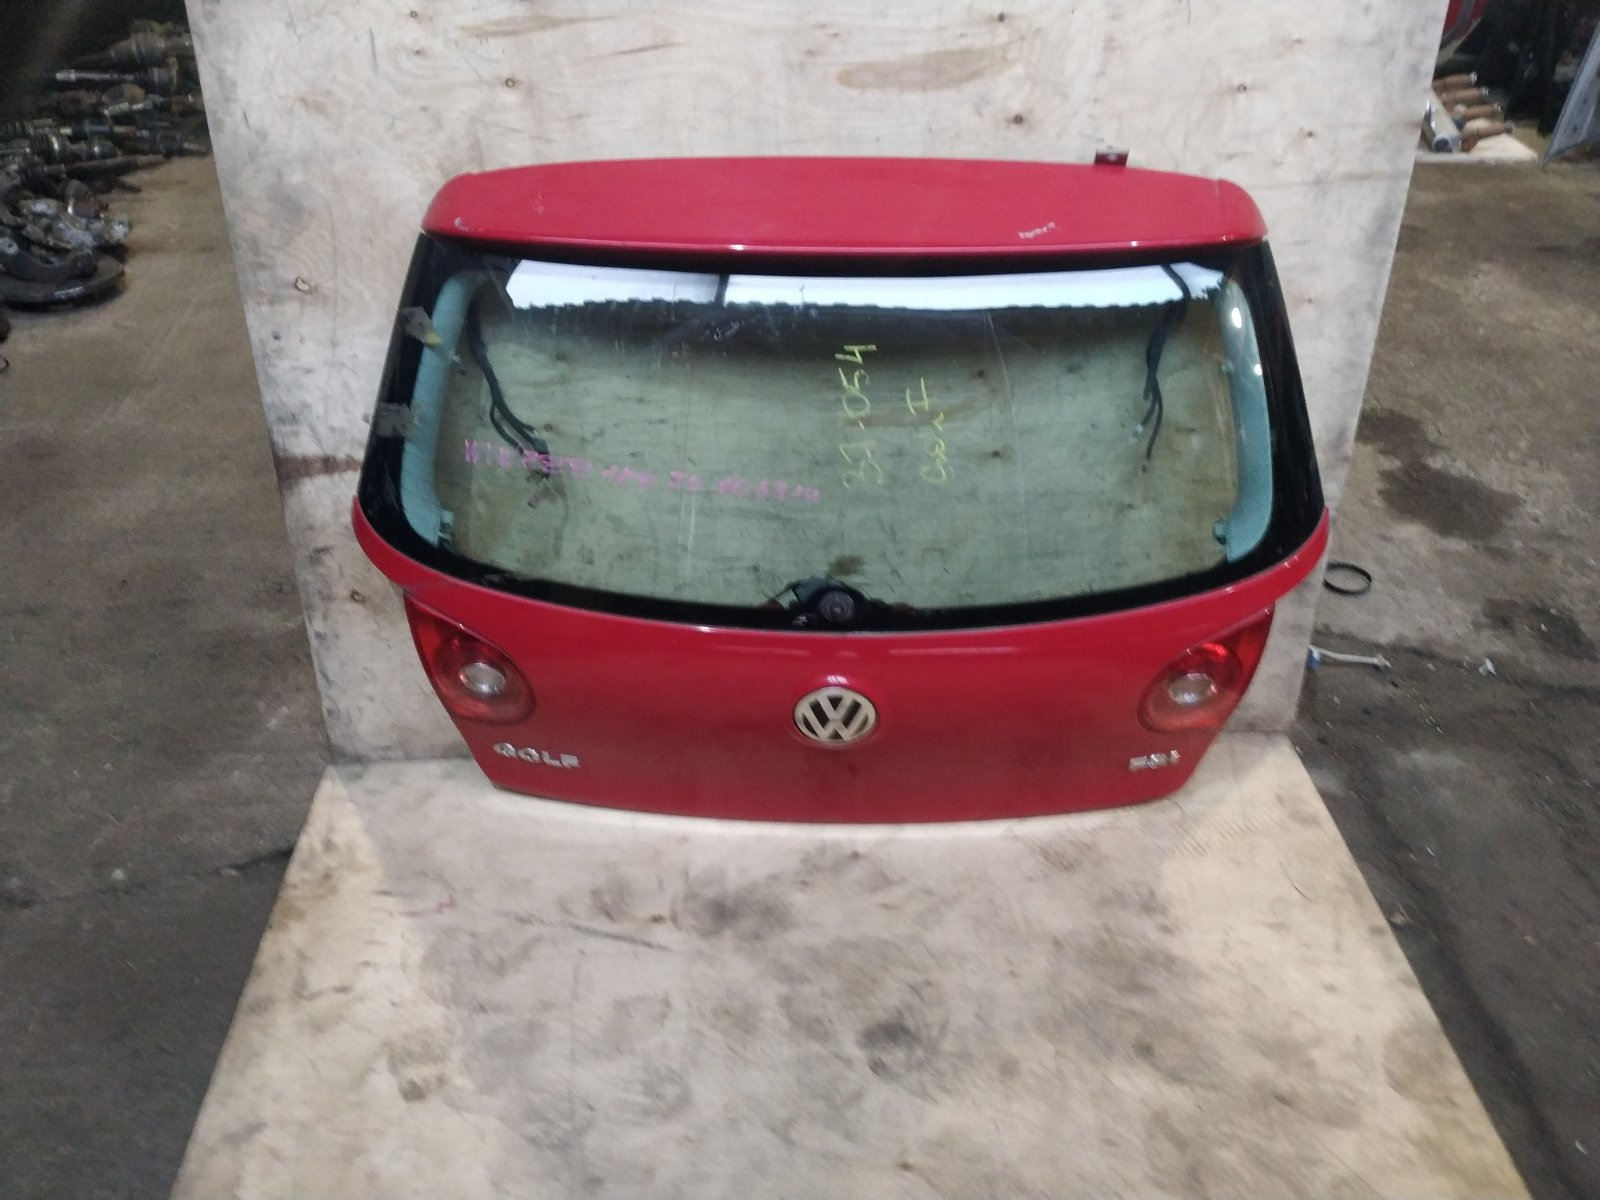 Дверь багажника Volkswagen Golf 5 ХЭТЧБЭК 2001 (б/у)